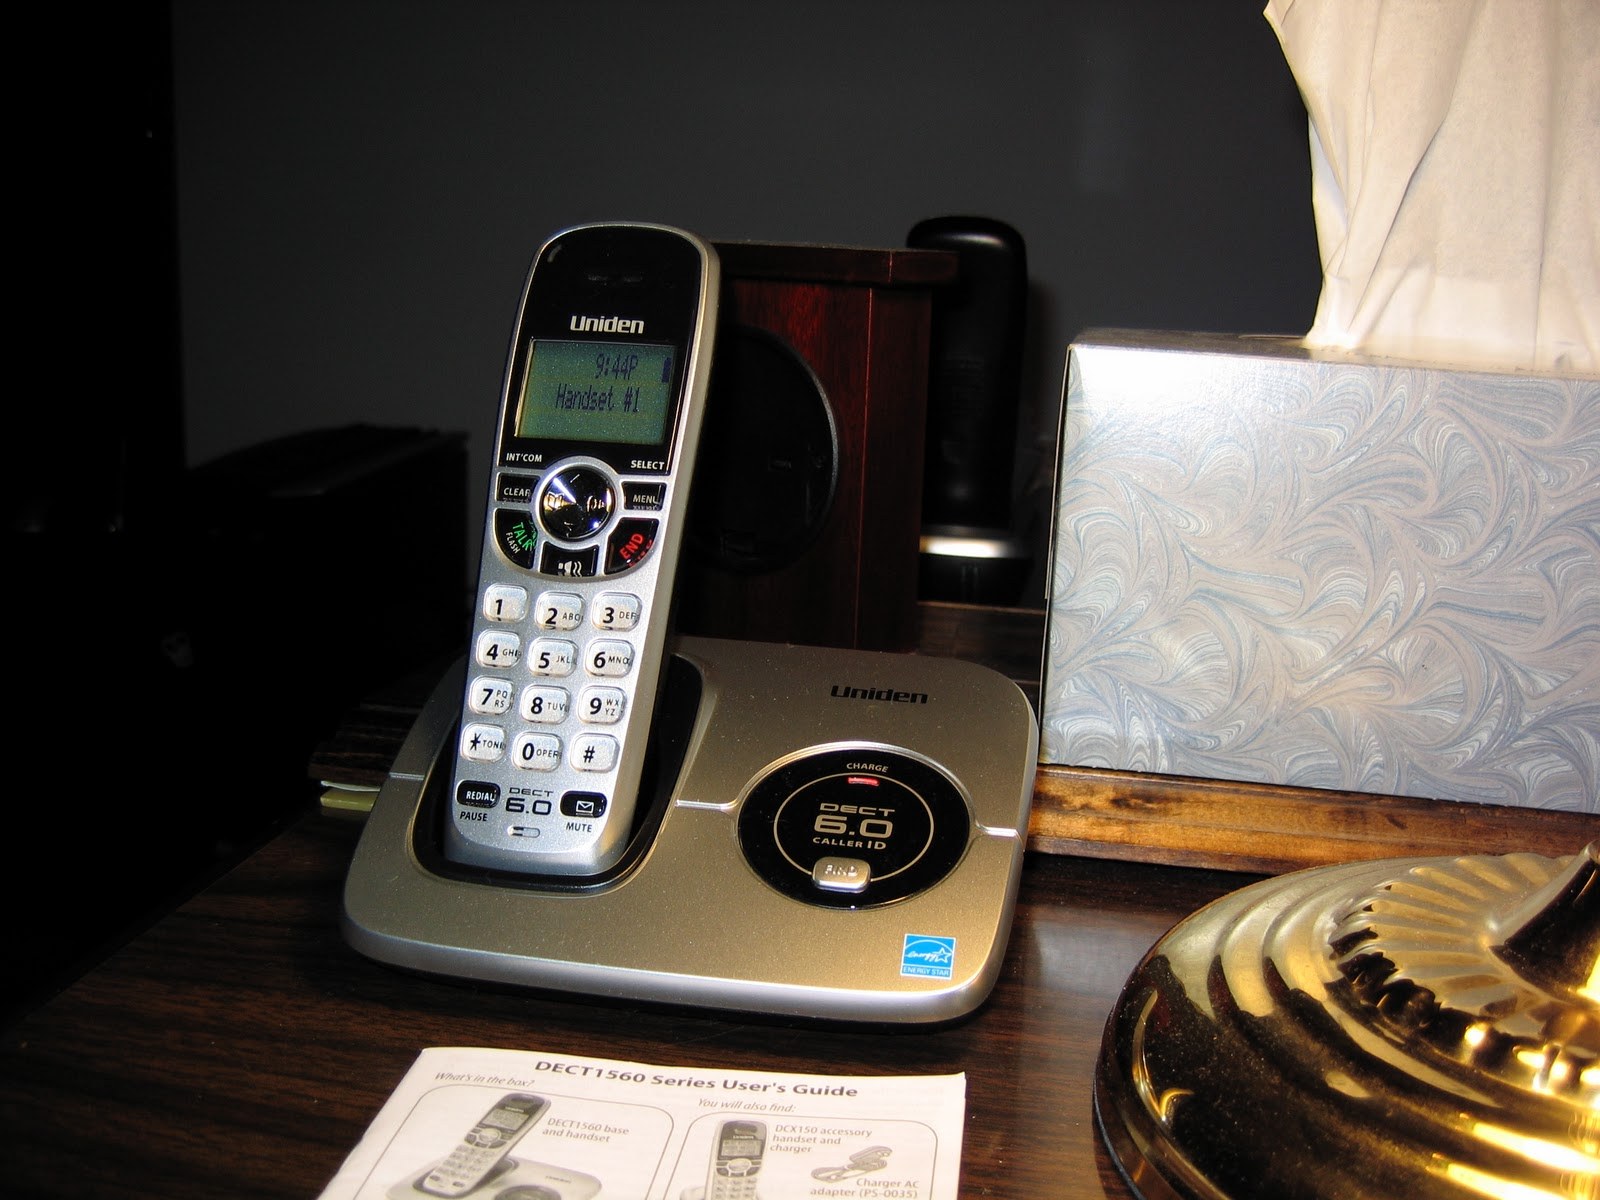 money saving tech tips philosophic musings uniden dect1560 rh money saving tech tips blogspot com Cordless Phones DECT 6.0 Manual Uniden Digital Answering System Phones